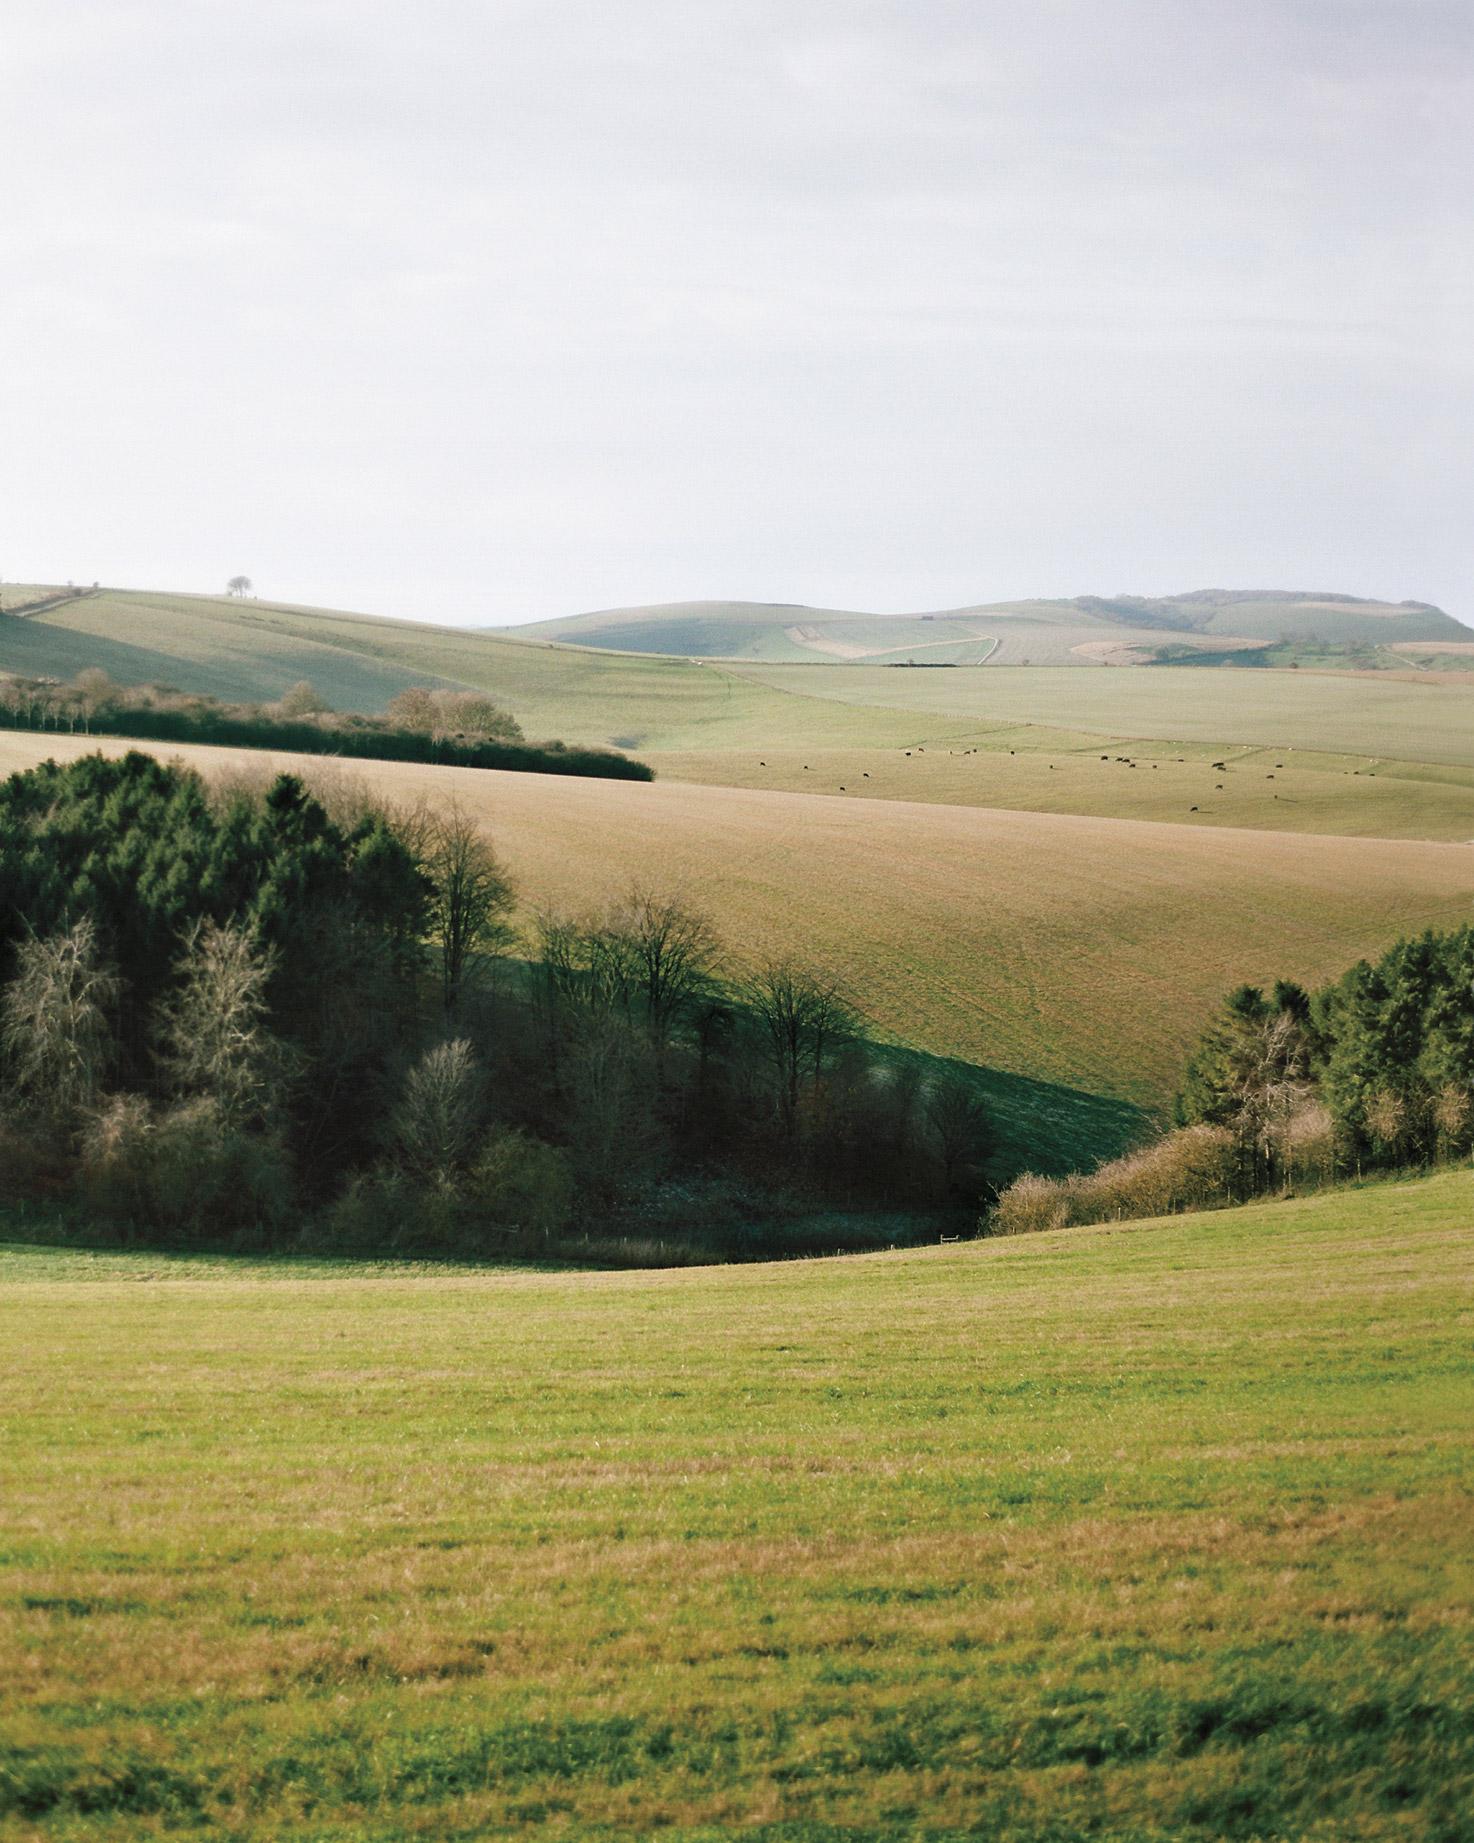 rw-heather-neal-scenic-hills-ms107641.jpg